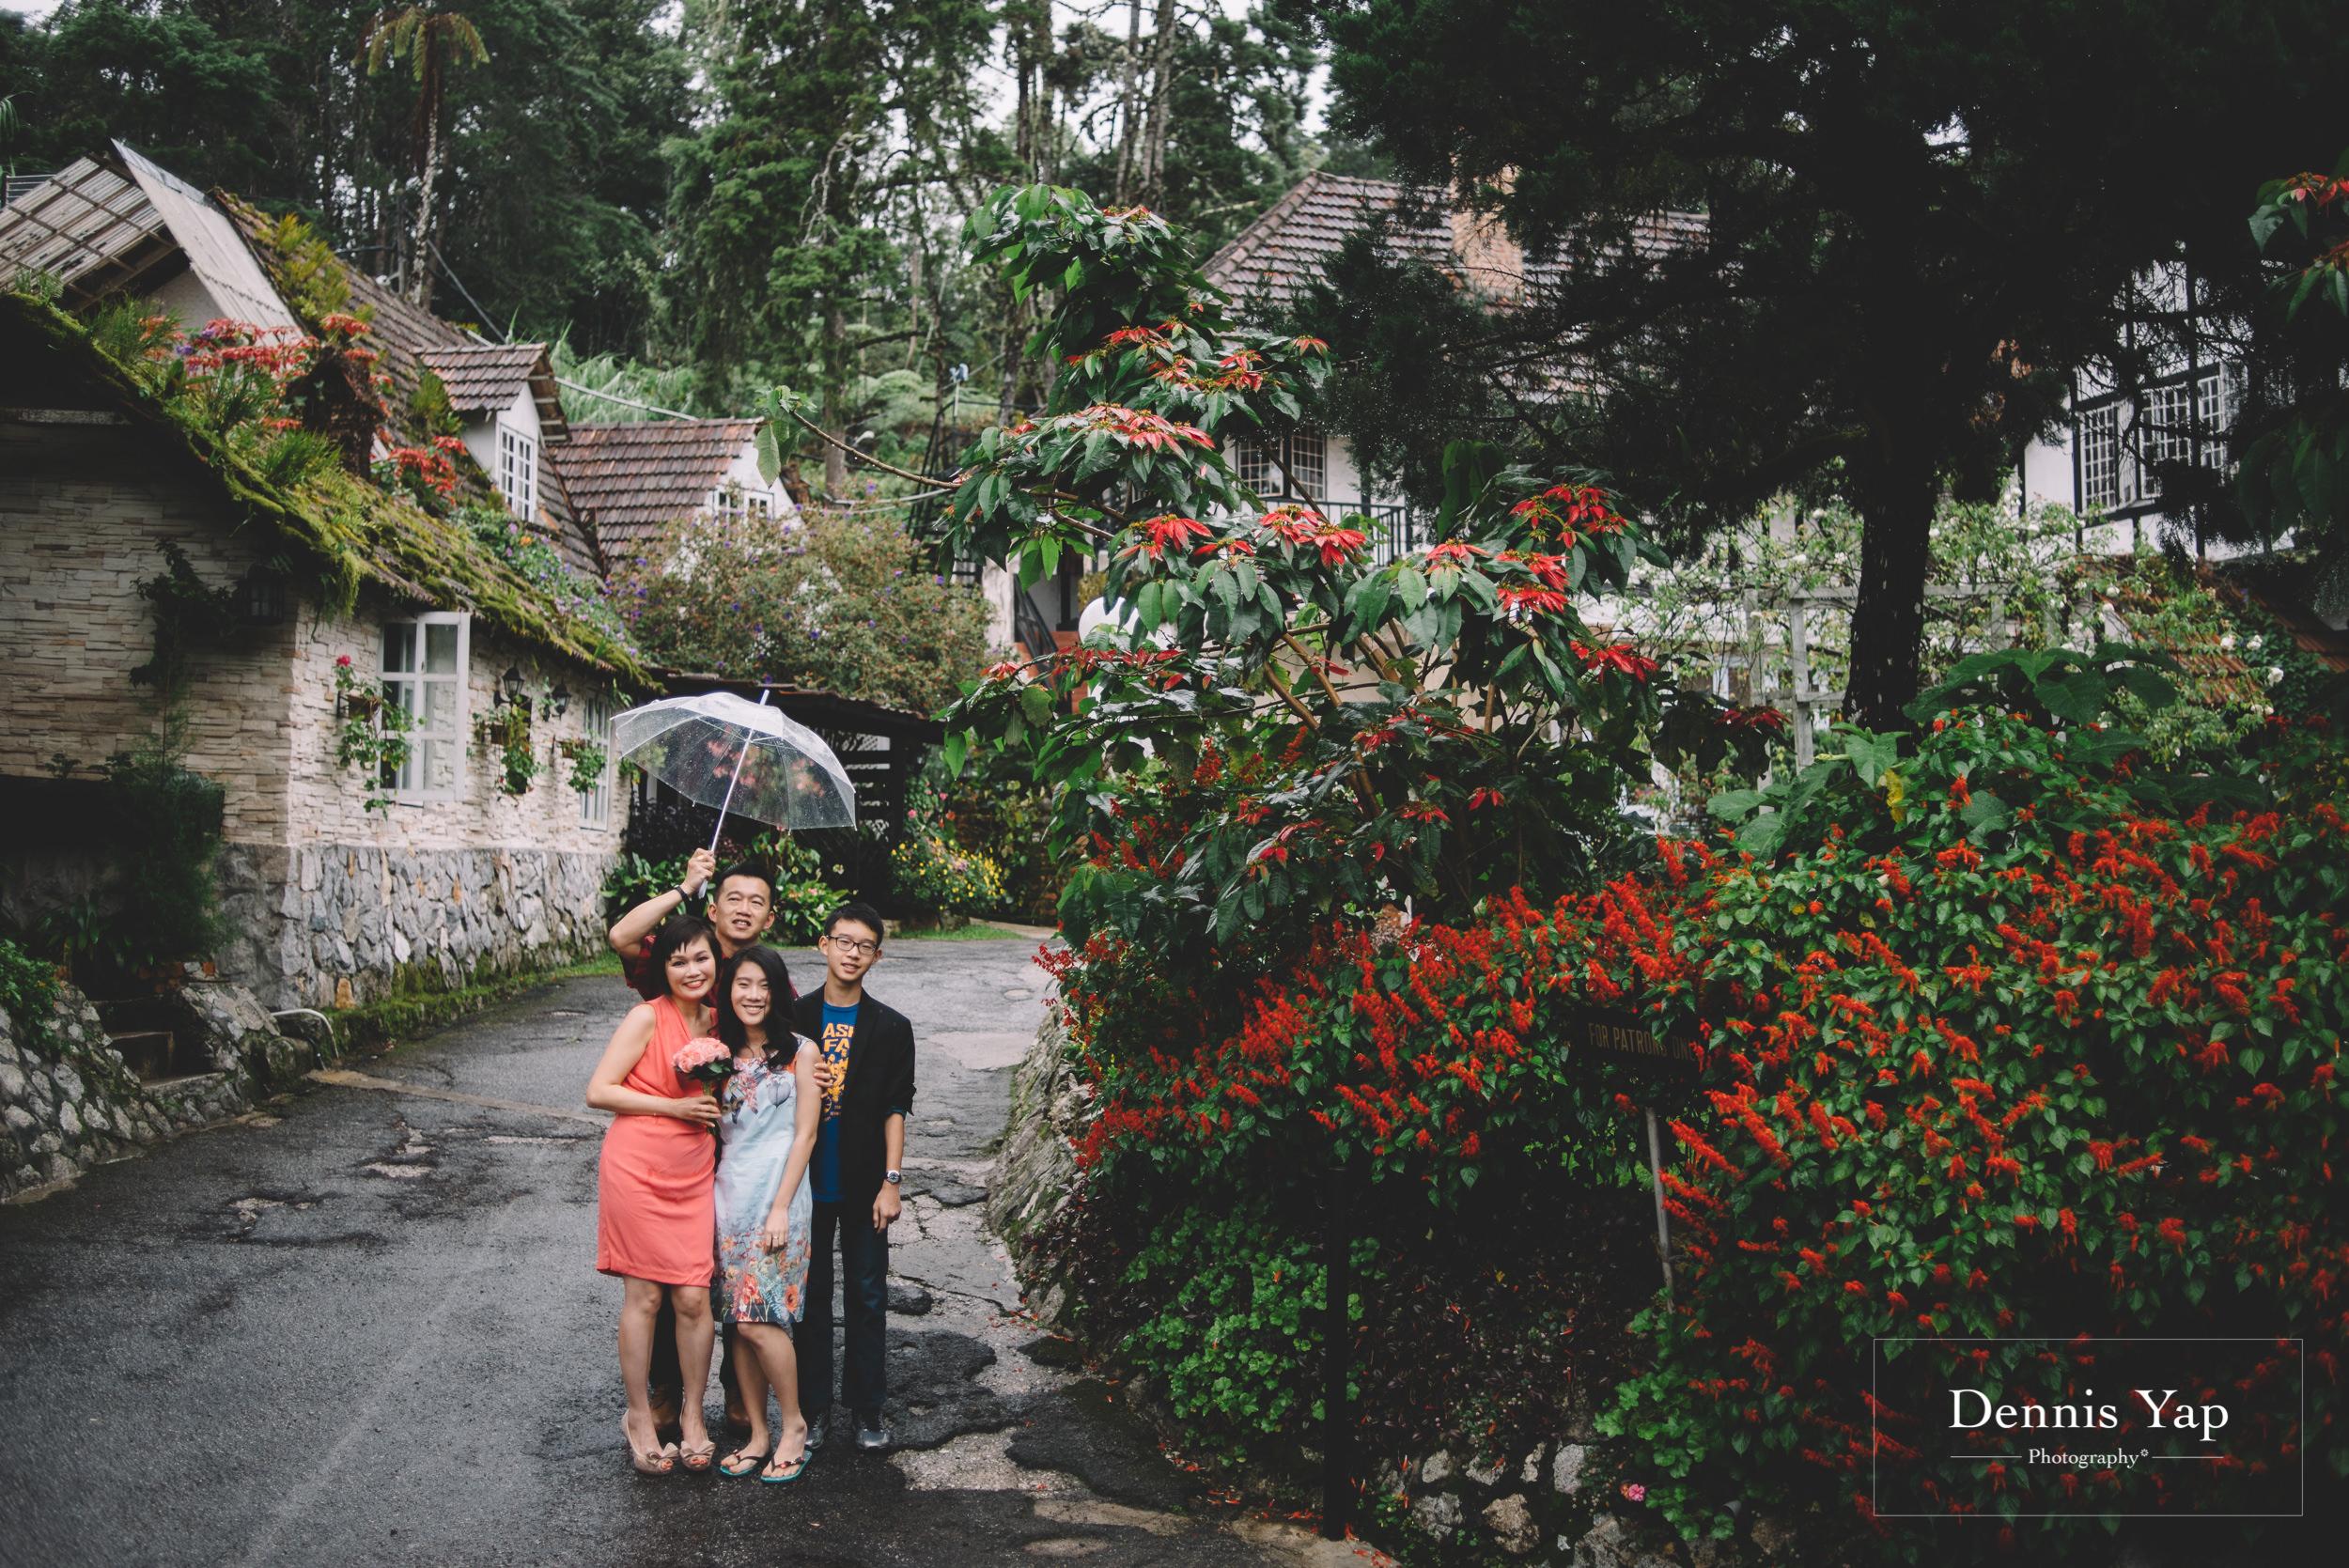 boon weng cyndy love family values pre wedding cameron highlands smoke house dennis yap photography-77.jpg